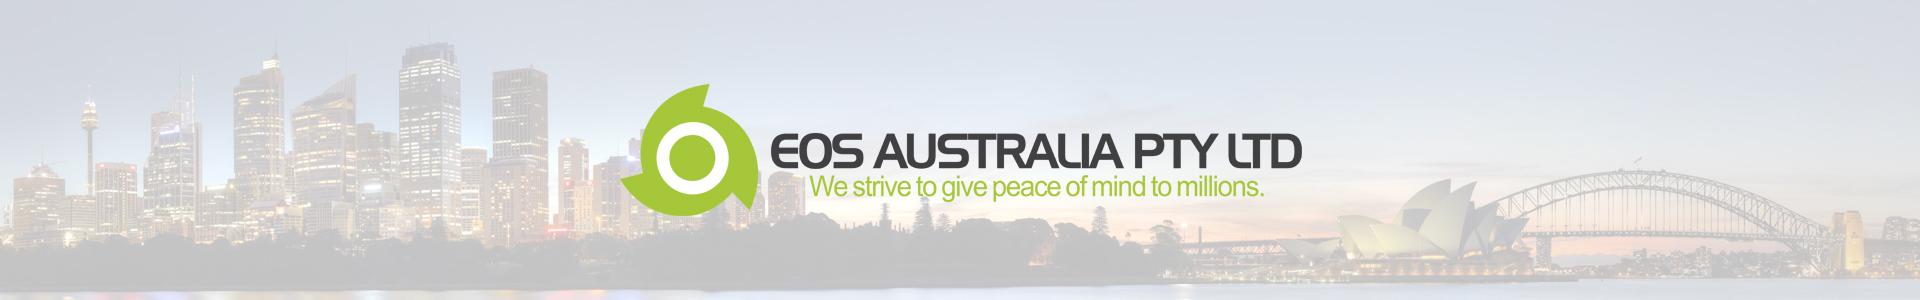 EOS Australia Banner image